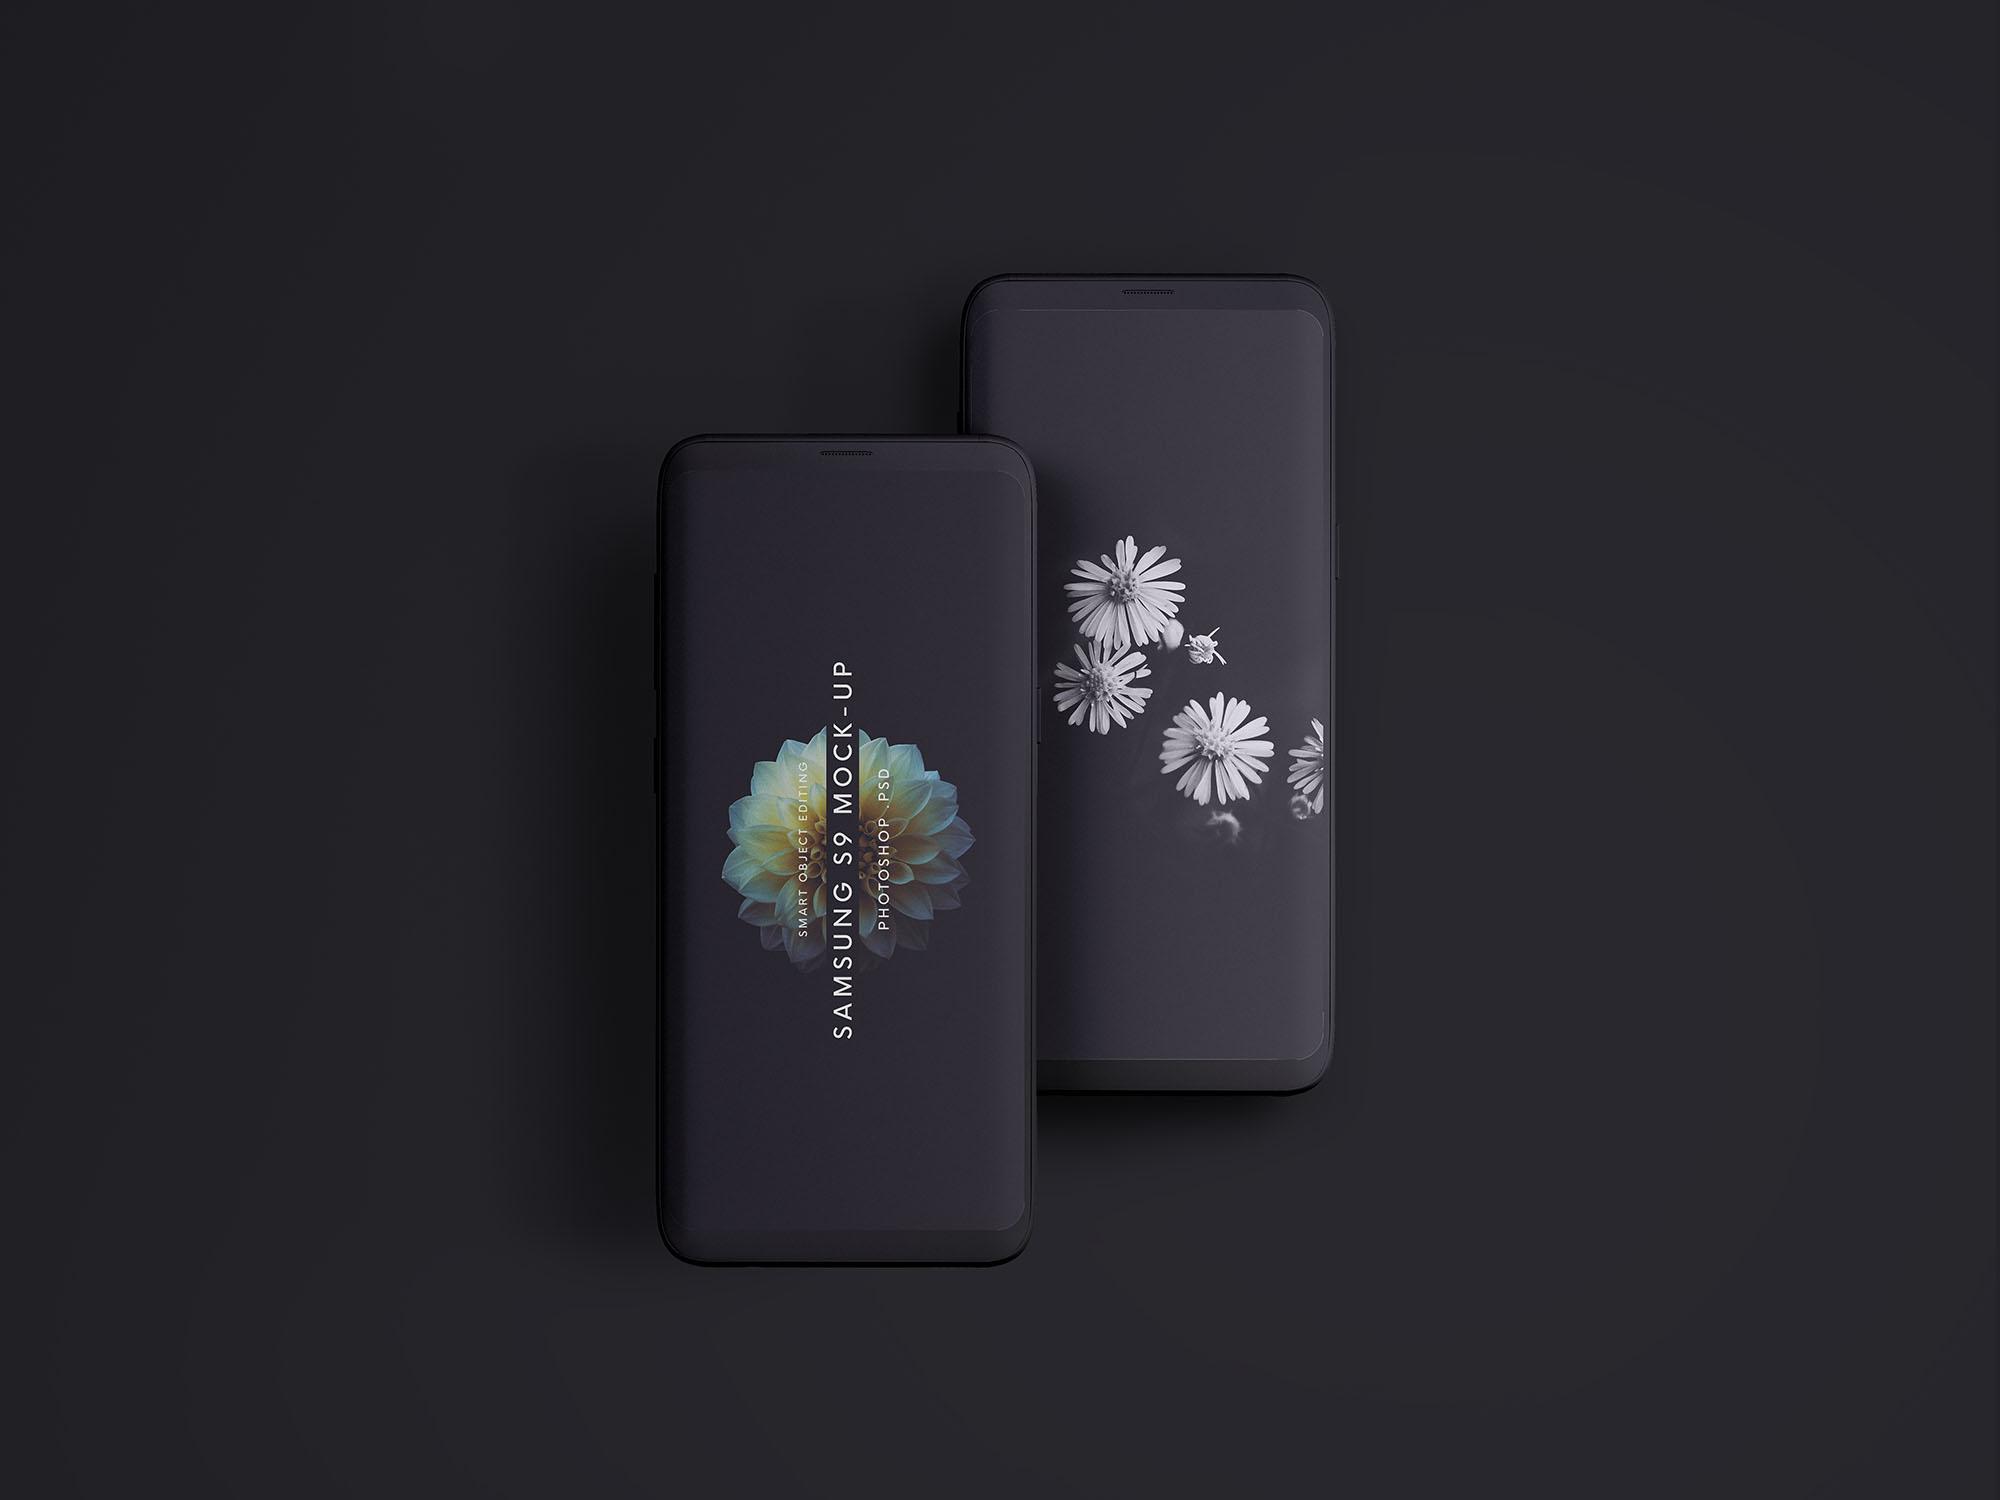 50+ Samsung Galaxy S9 / S9+ Mockup Templates   Decolore Net